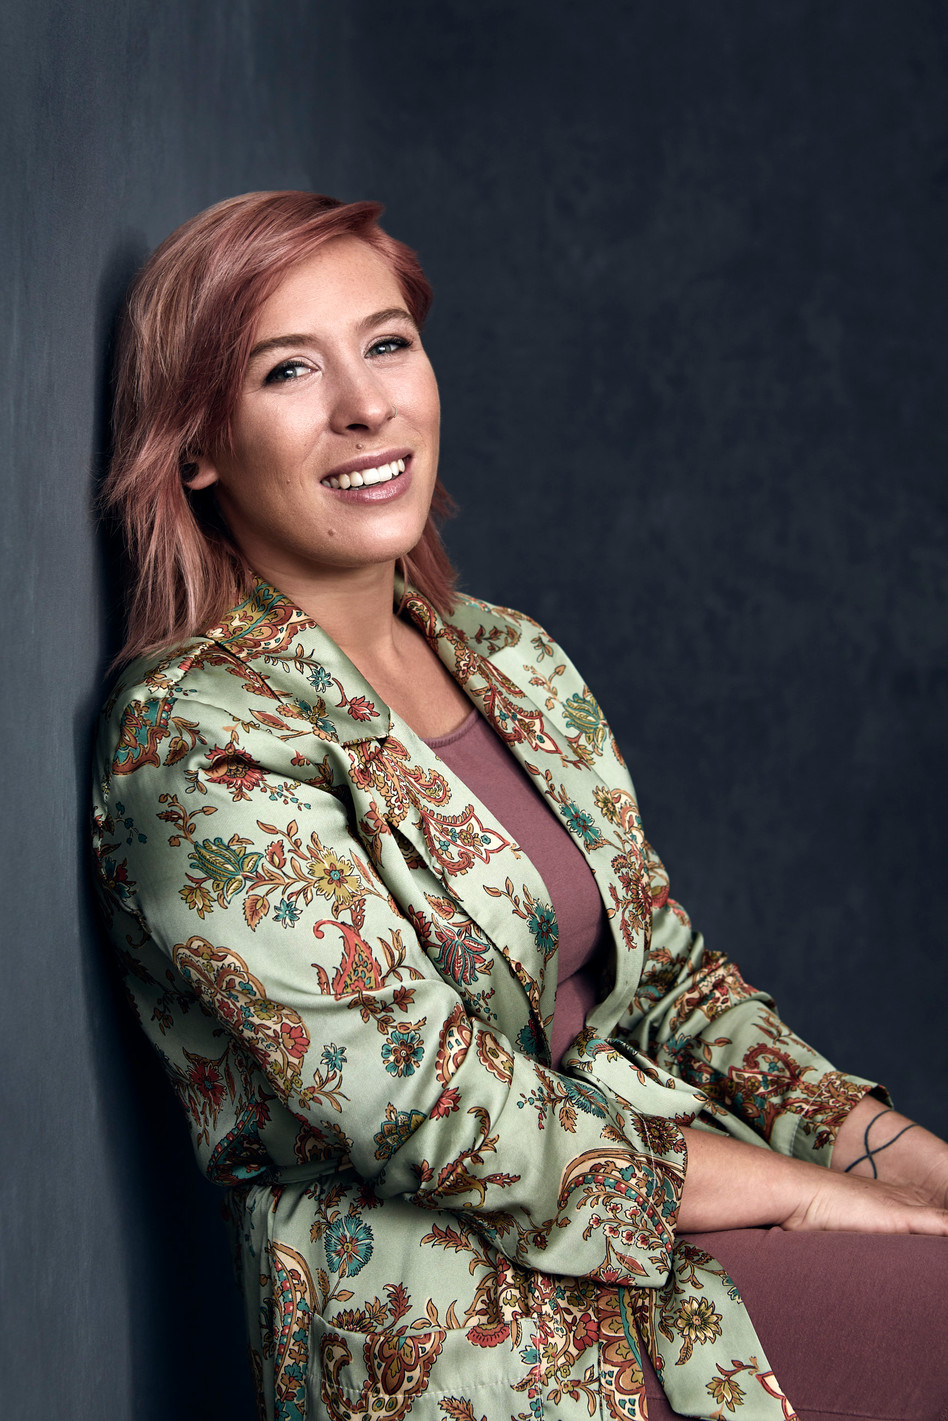 Lisa Pignoloni - De Kapbar